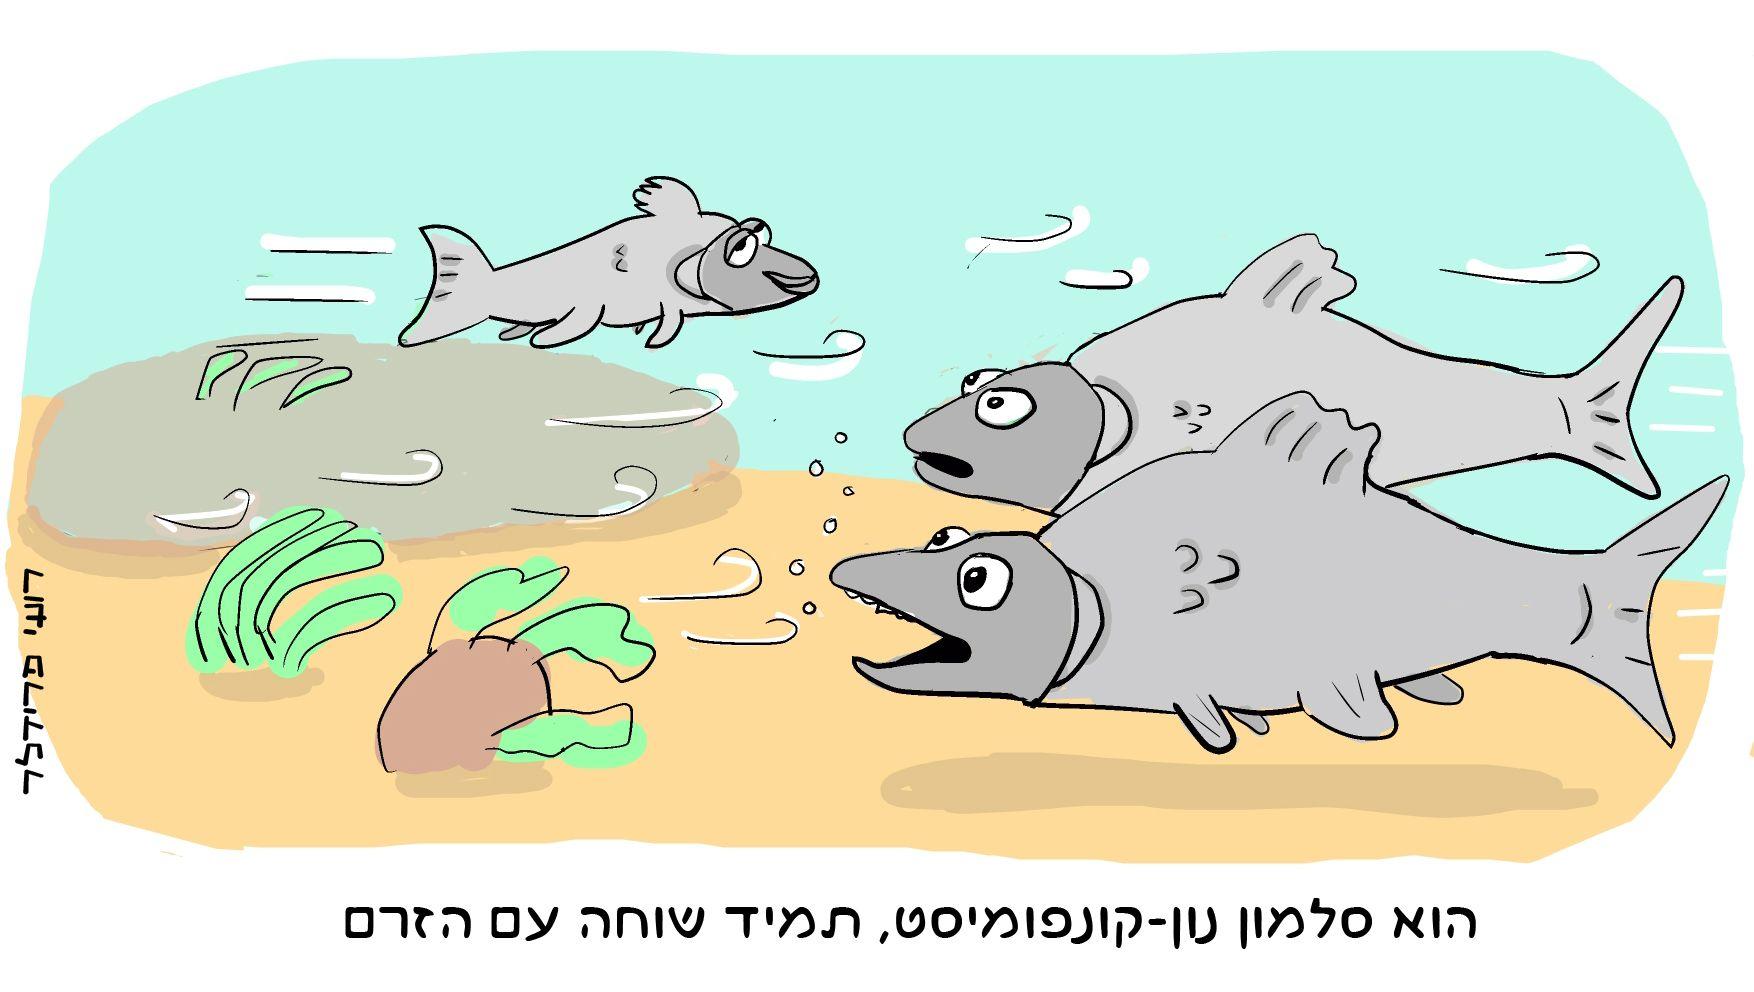 Pin by Roy Friedler on gag cartoons | Cartoon, Fictional